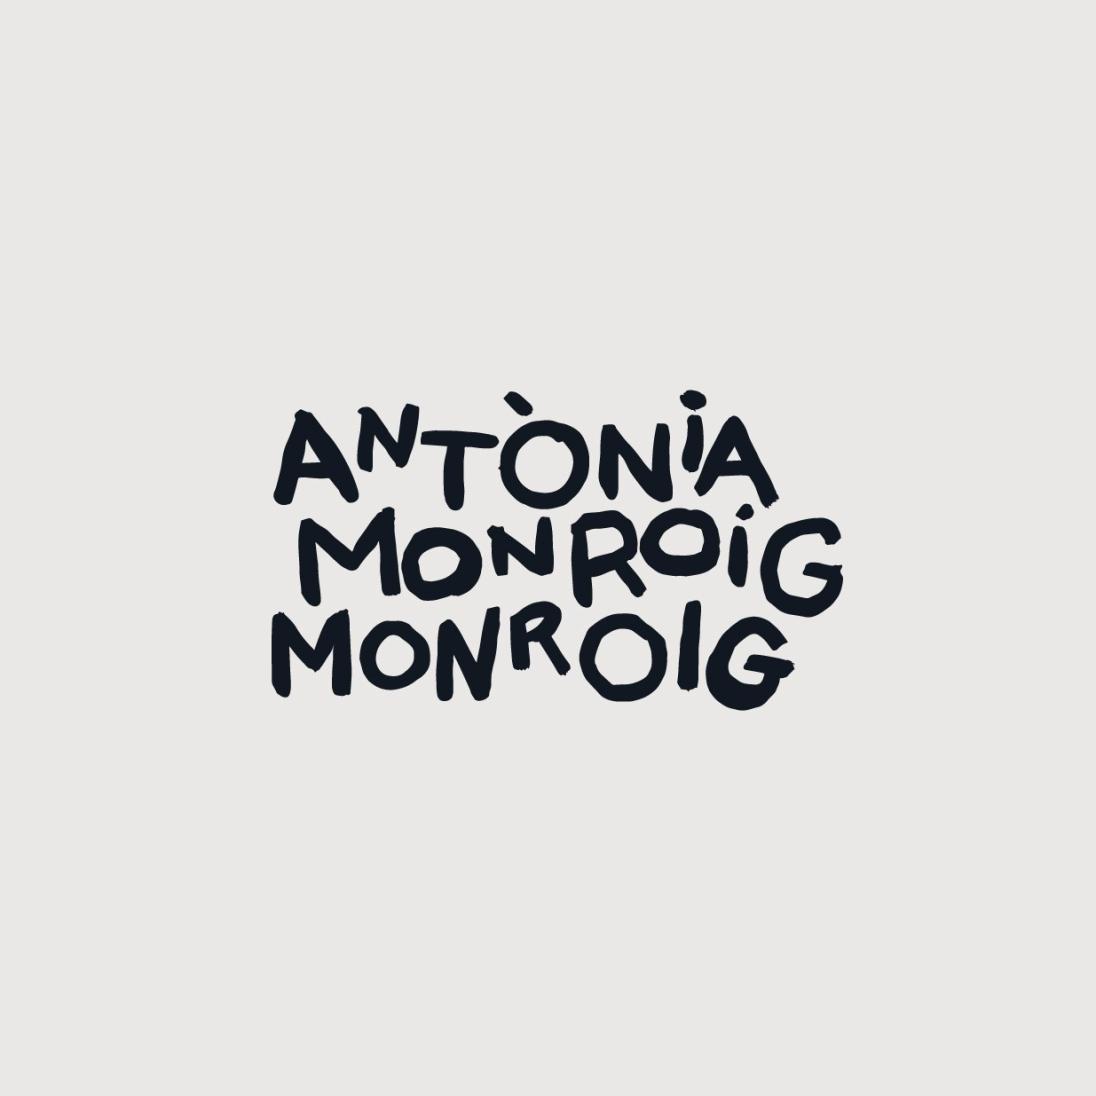 Antònia Monroig Monroig disseny